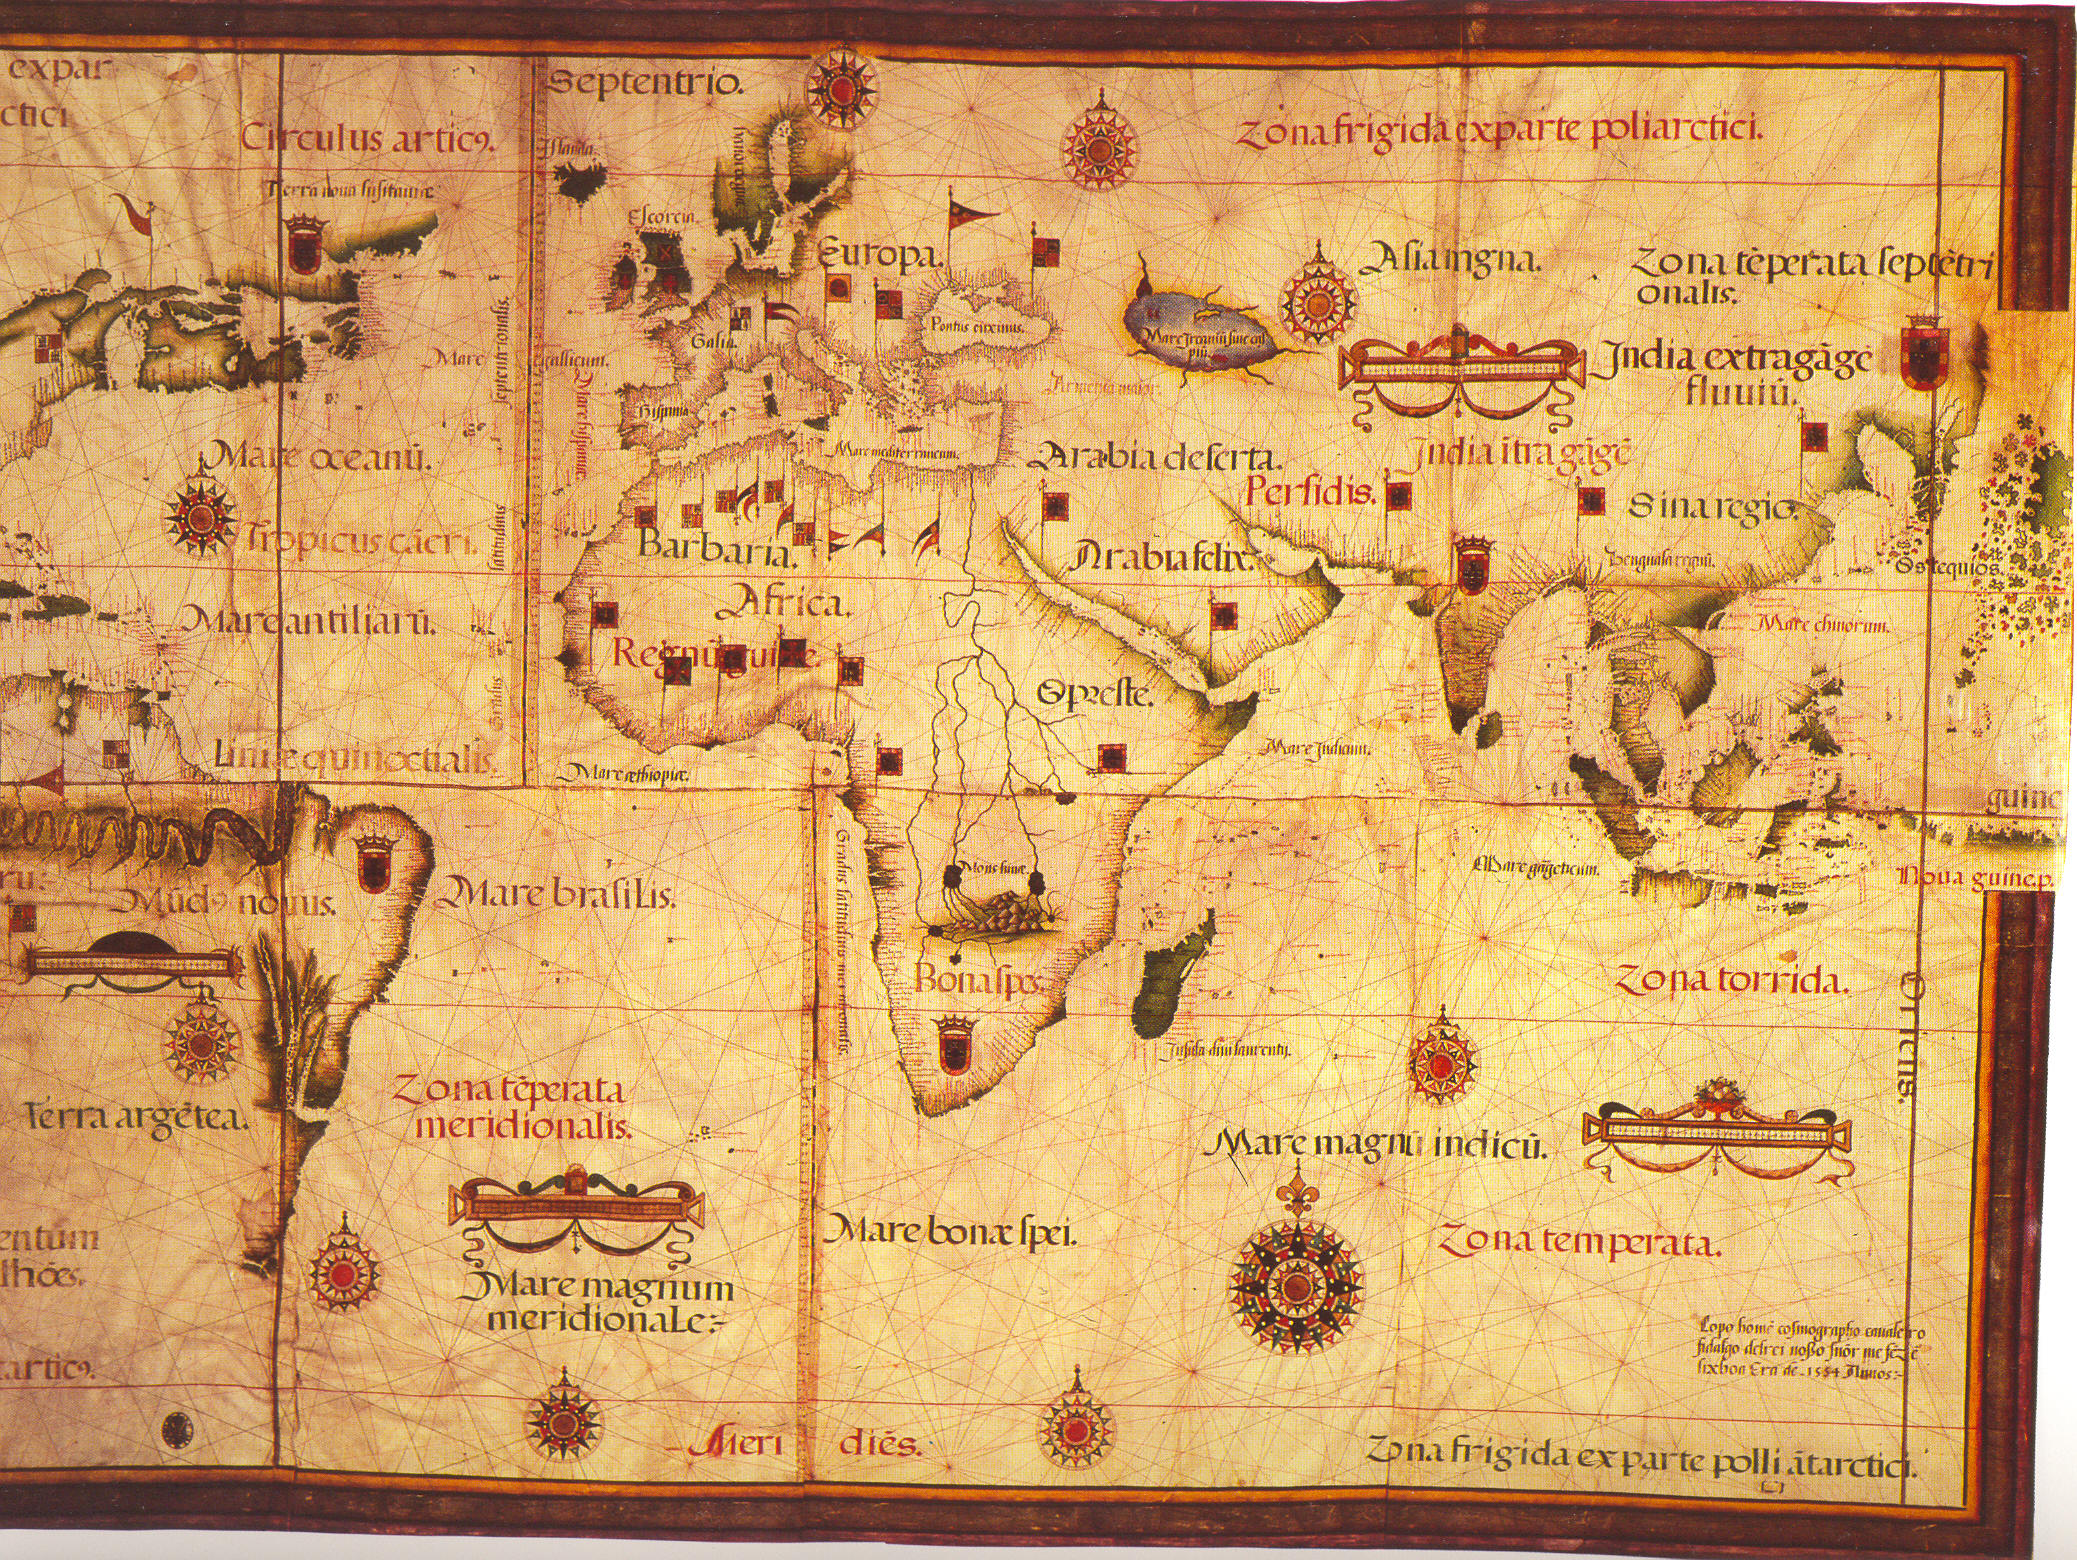 File:1554 lopo homen mapa mundi 03.jpg